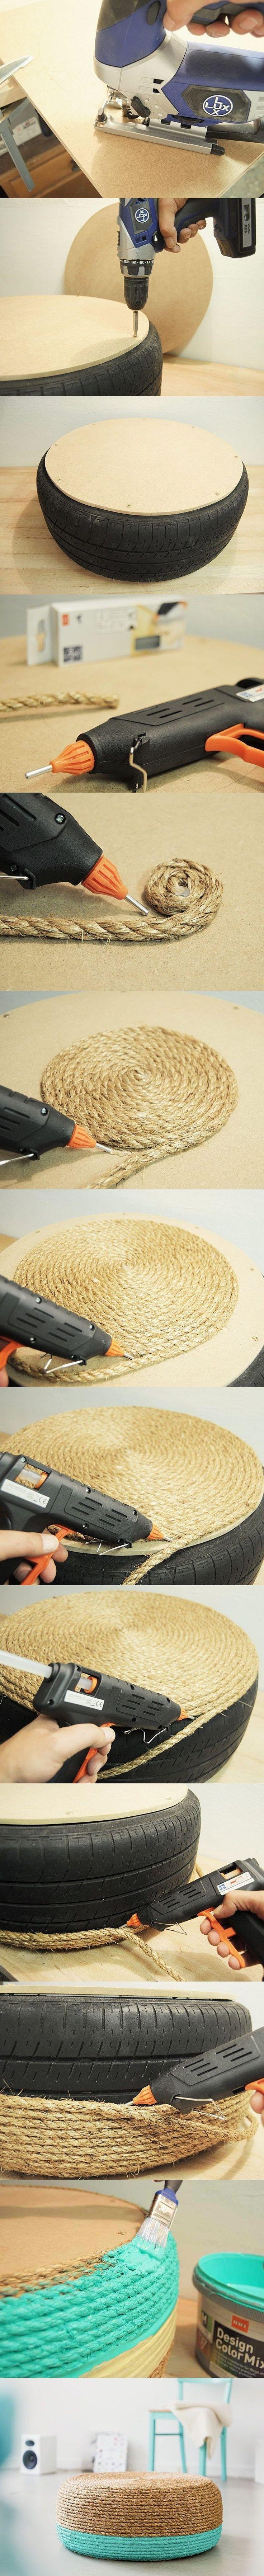 DIY: Taburete turquesa de bajo costo / http://www.tres-studio-blog.com